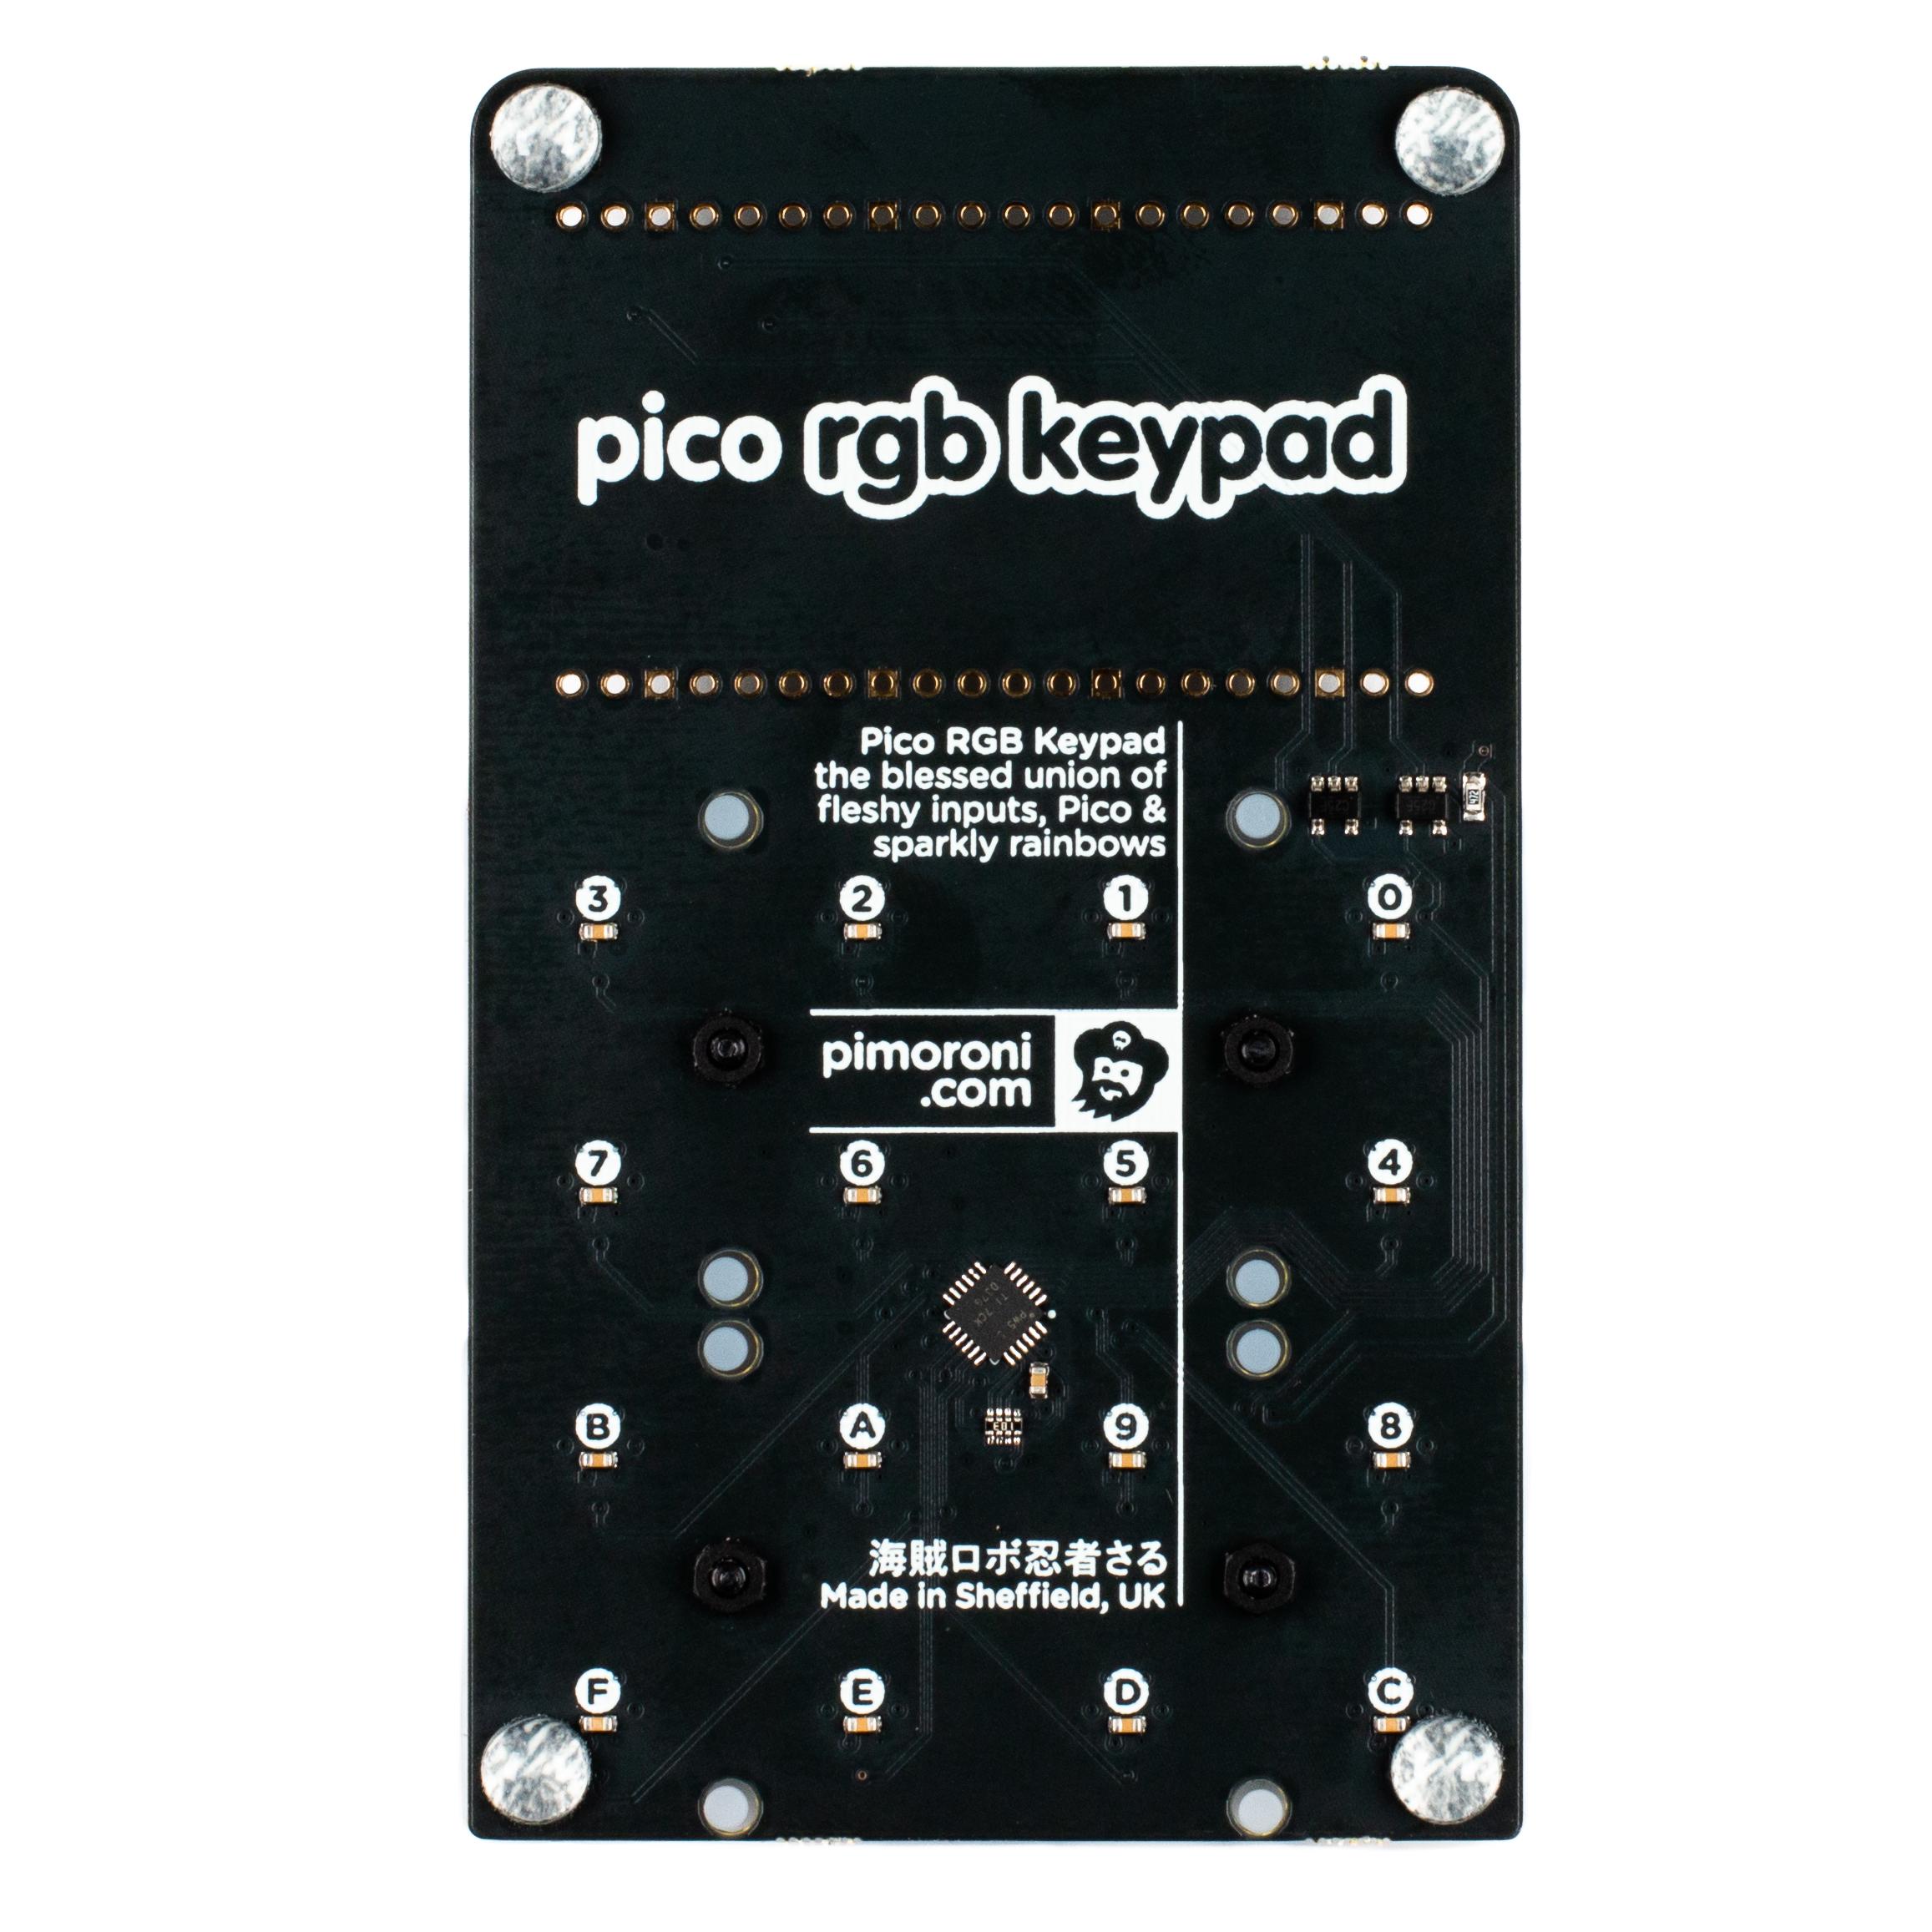 Pimoroni Pico RGB Keypad Base